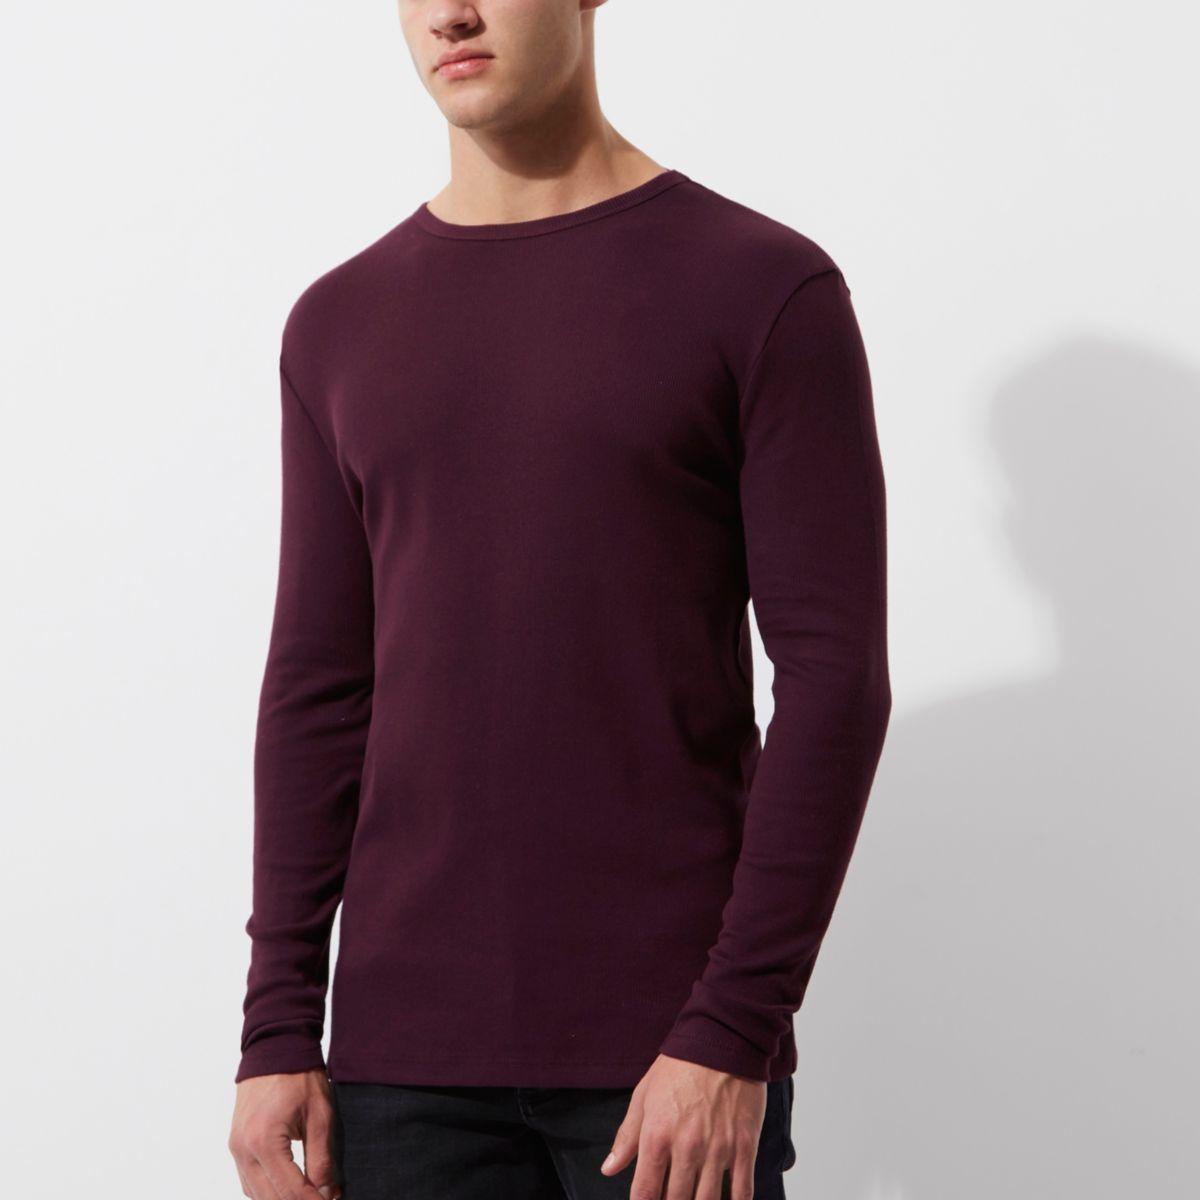 Donkerrood slim-fit T-shirt met lange mouwen